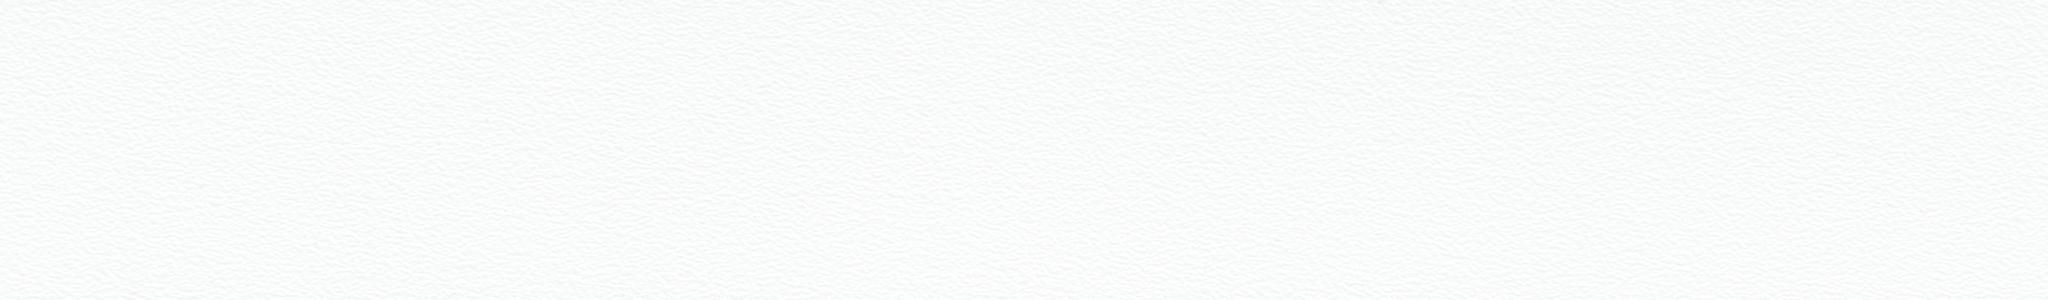 HU 101102 Кромка ABS Мел Белый - Шагрень XG